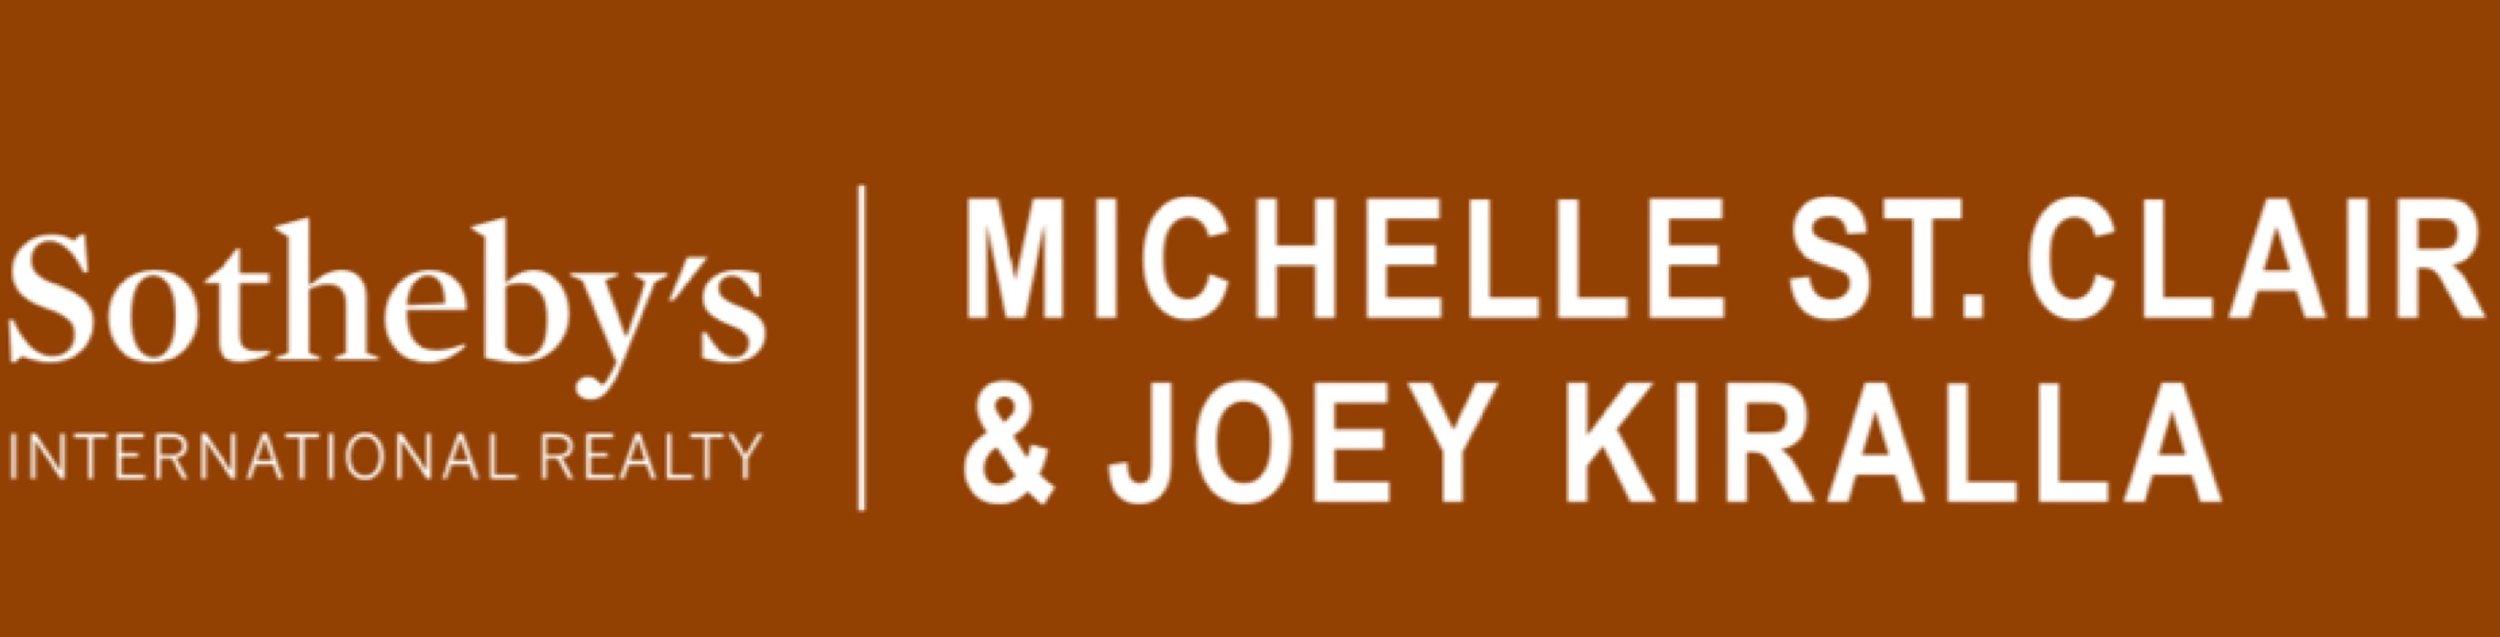 Sotheby's Michelle St. Clair & Joey Kiralla